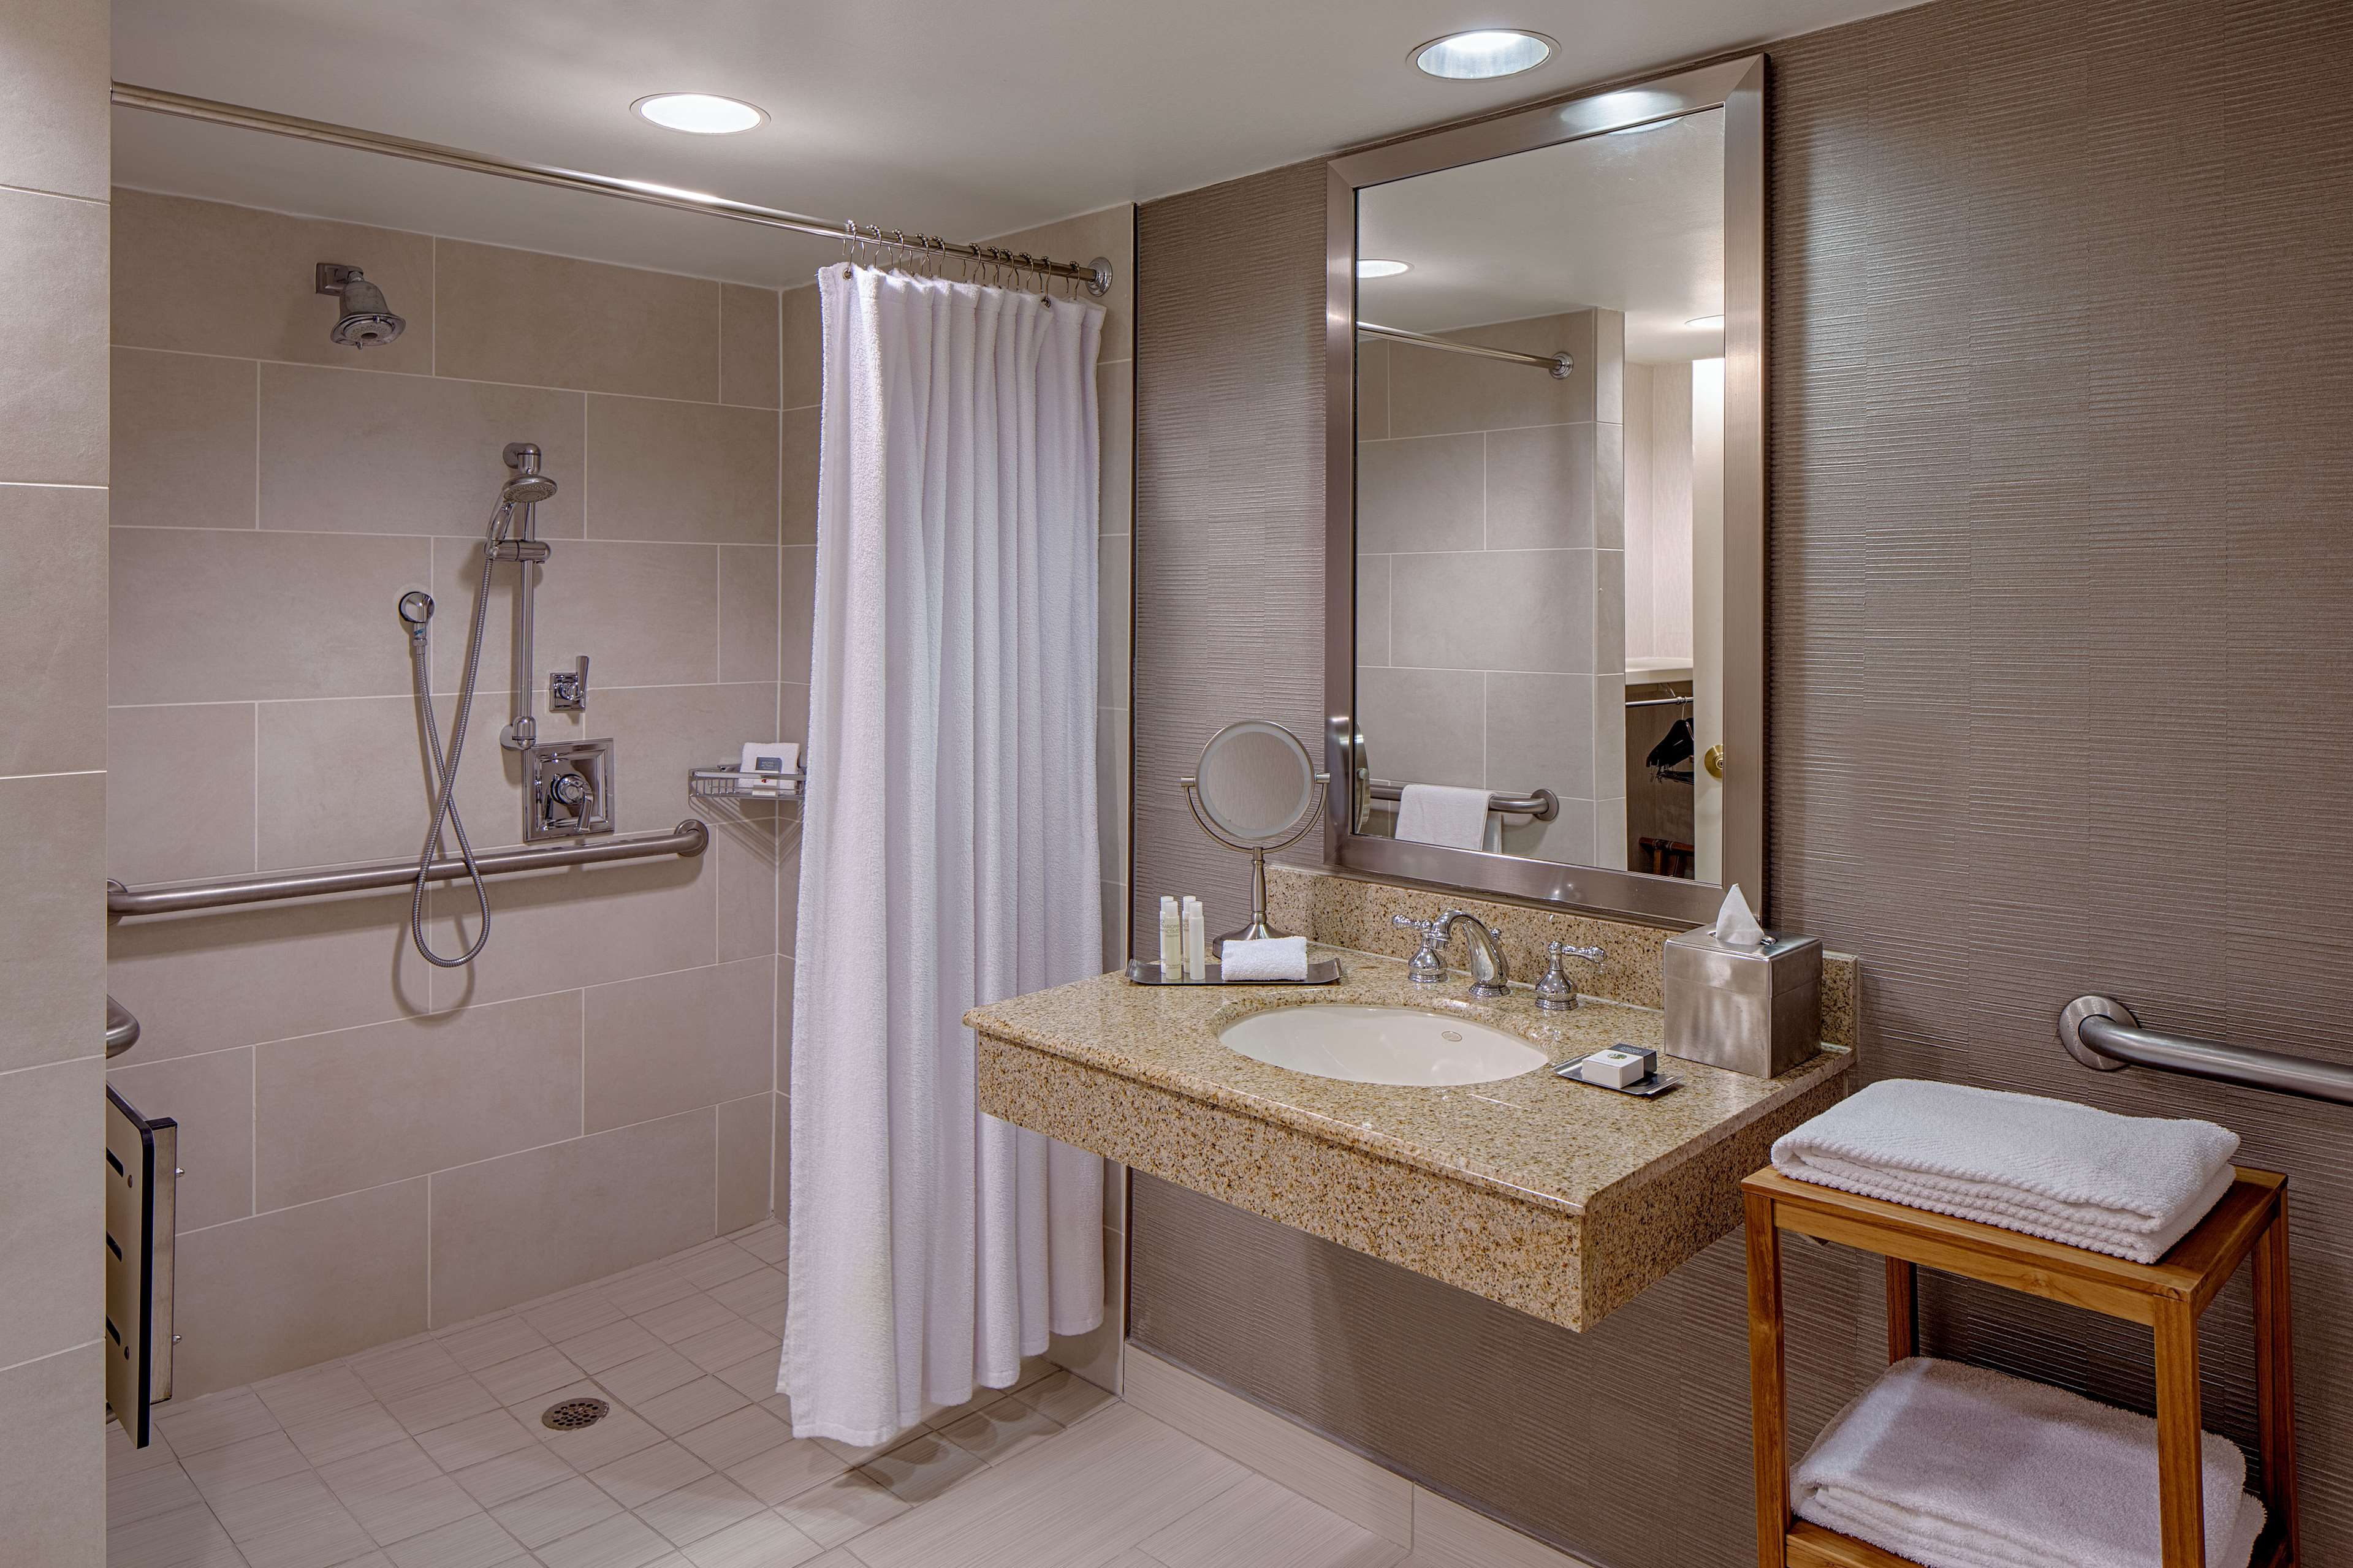 DoubleTree by Hilton Hotel Houston - Greenway Plaza image 21